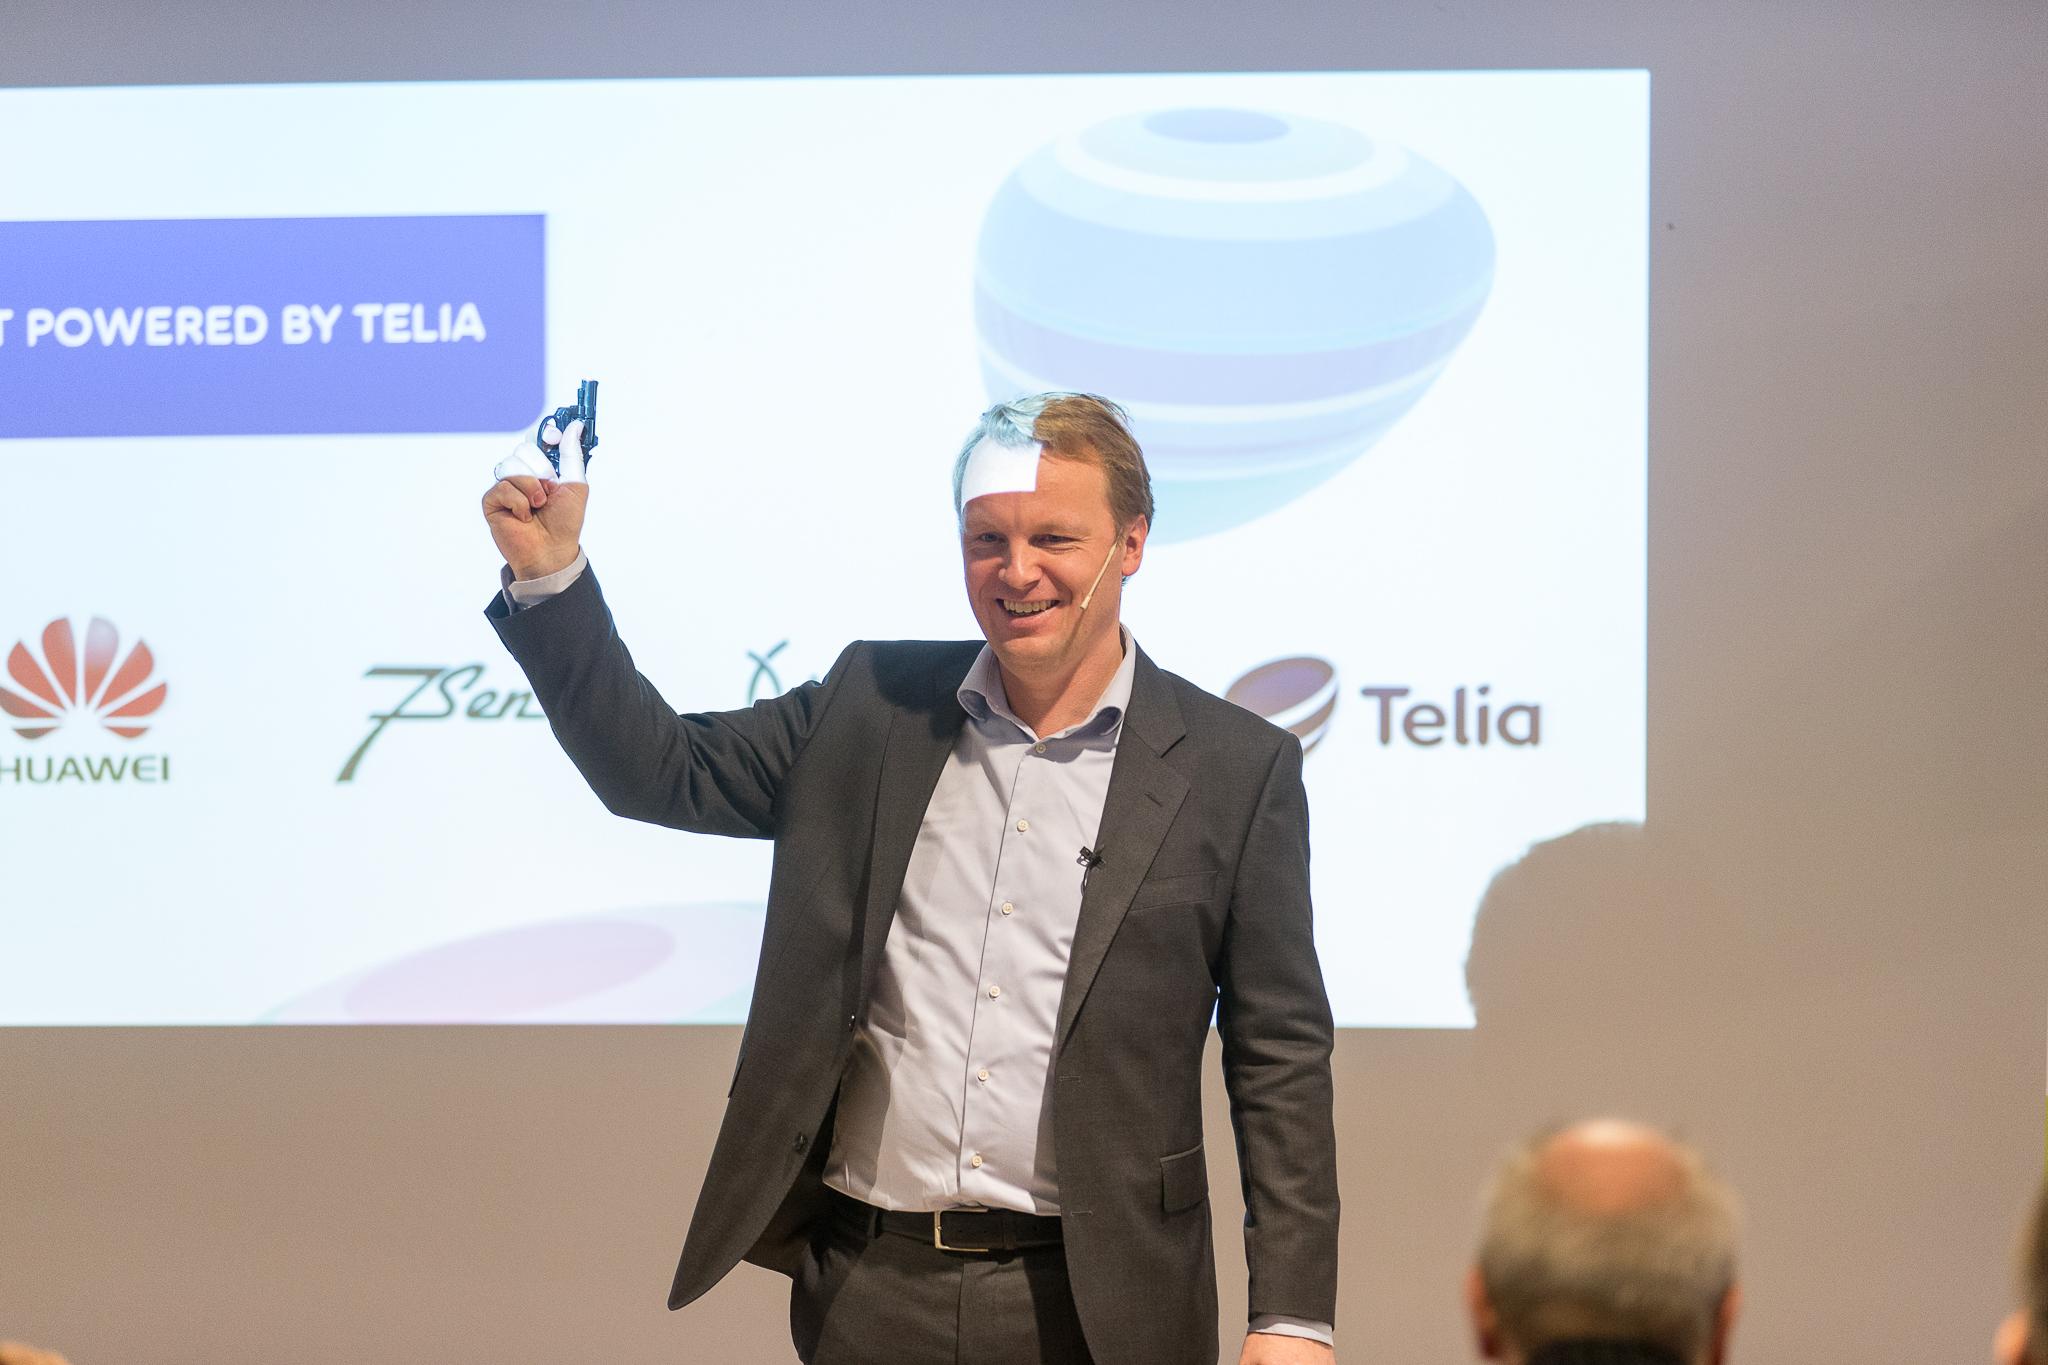 Her går startskuddet for Telias kommersielle satsning på IoT.